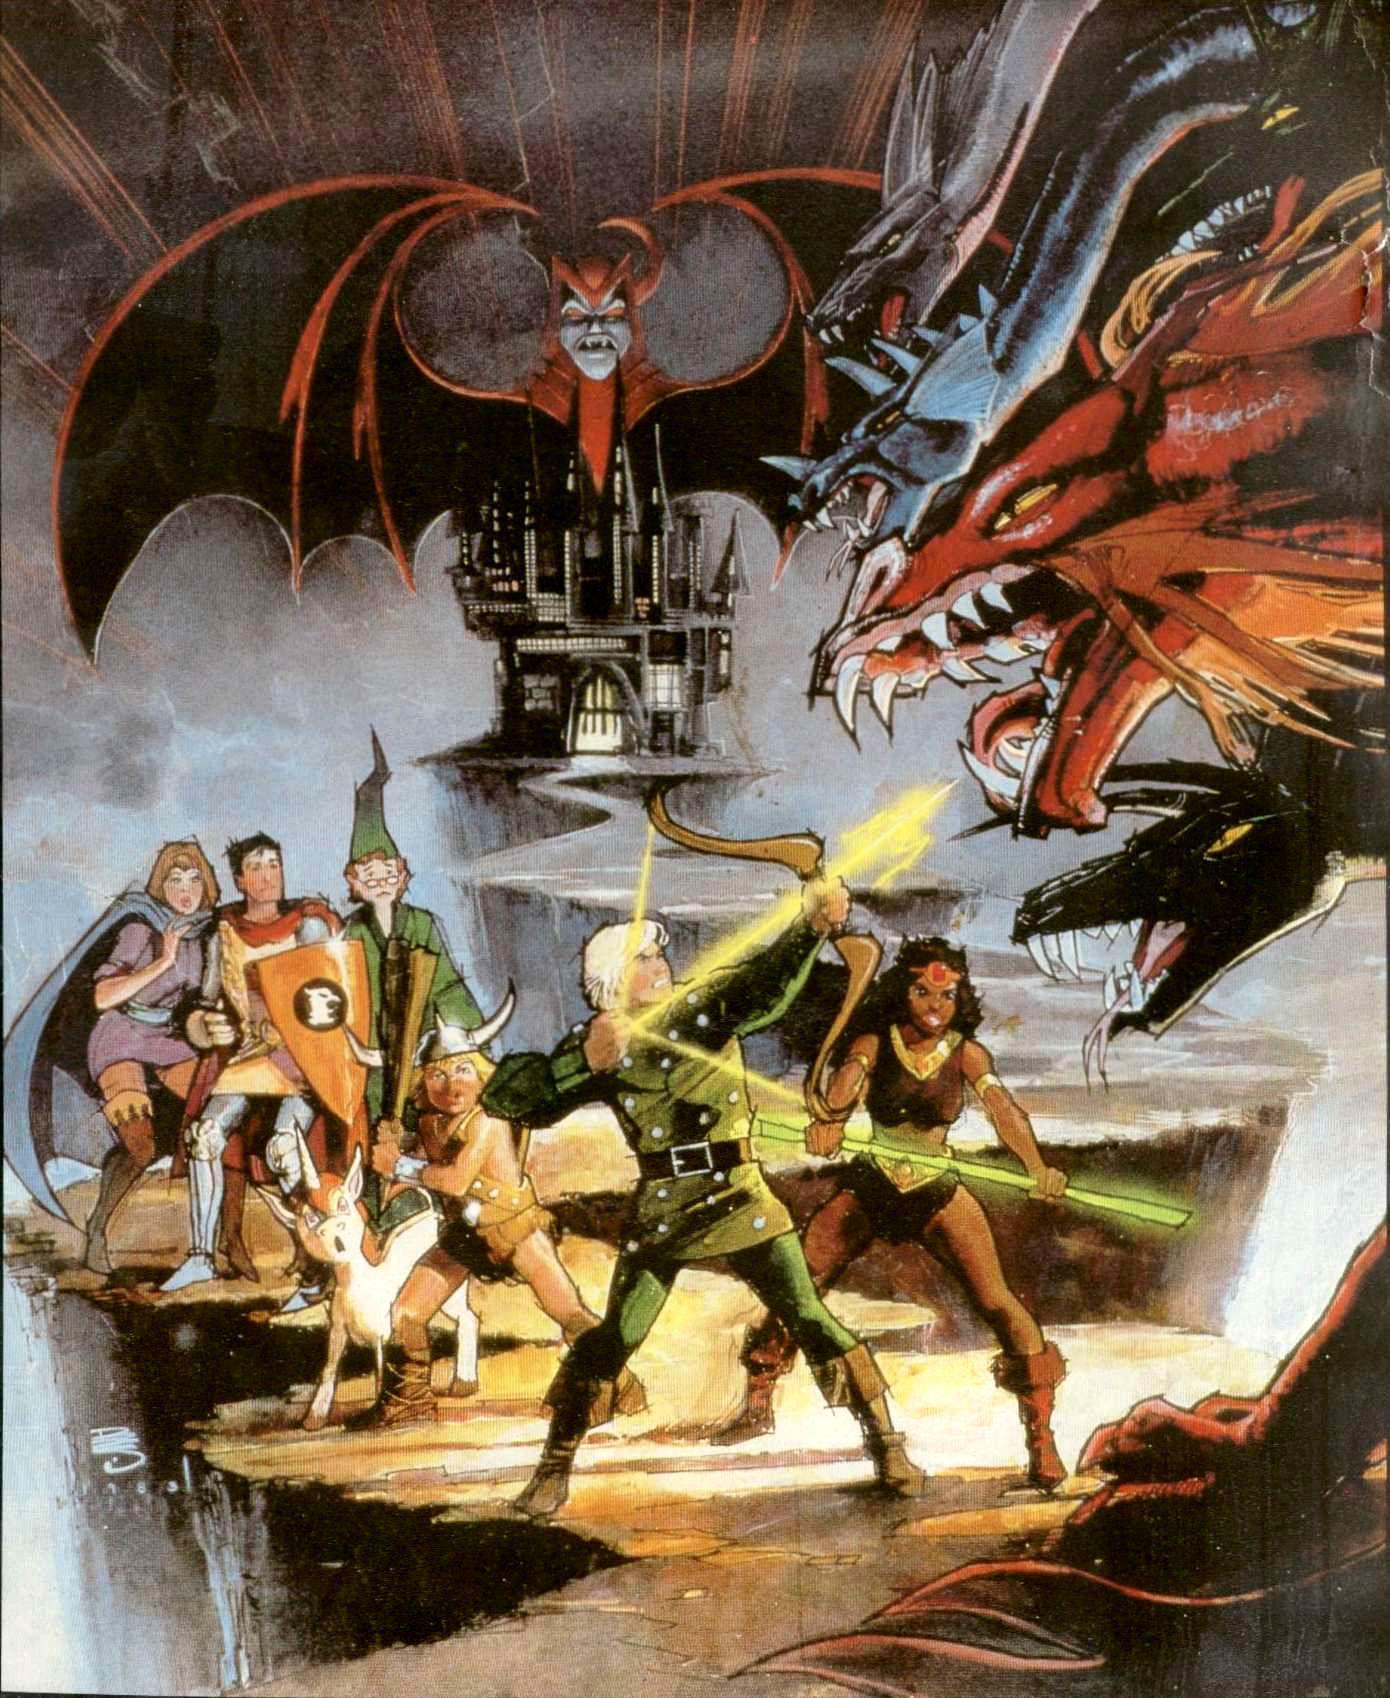 Dungeons u dragons tv series artwork cartoons pinterest